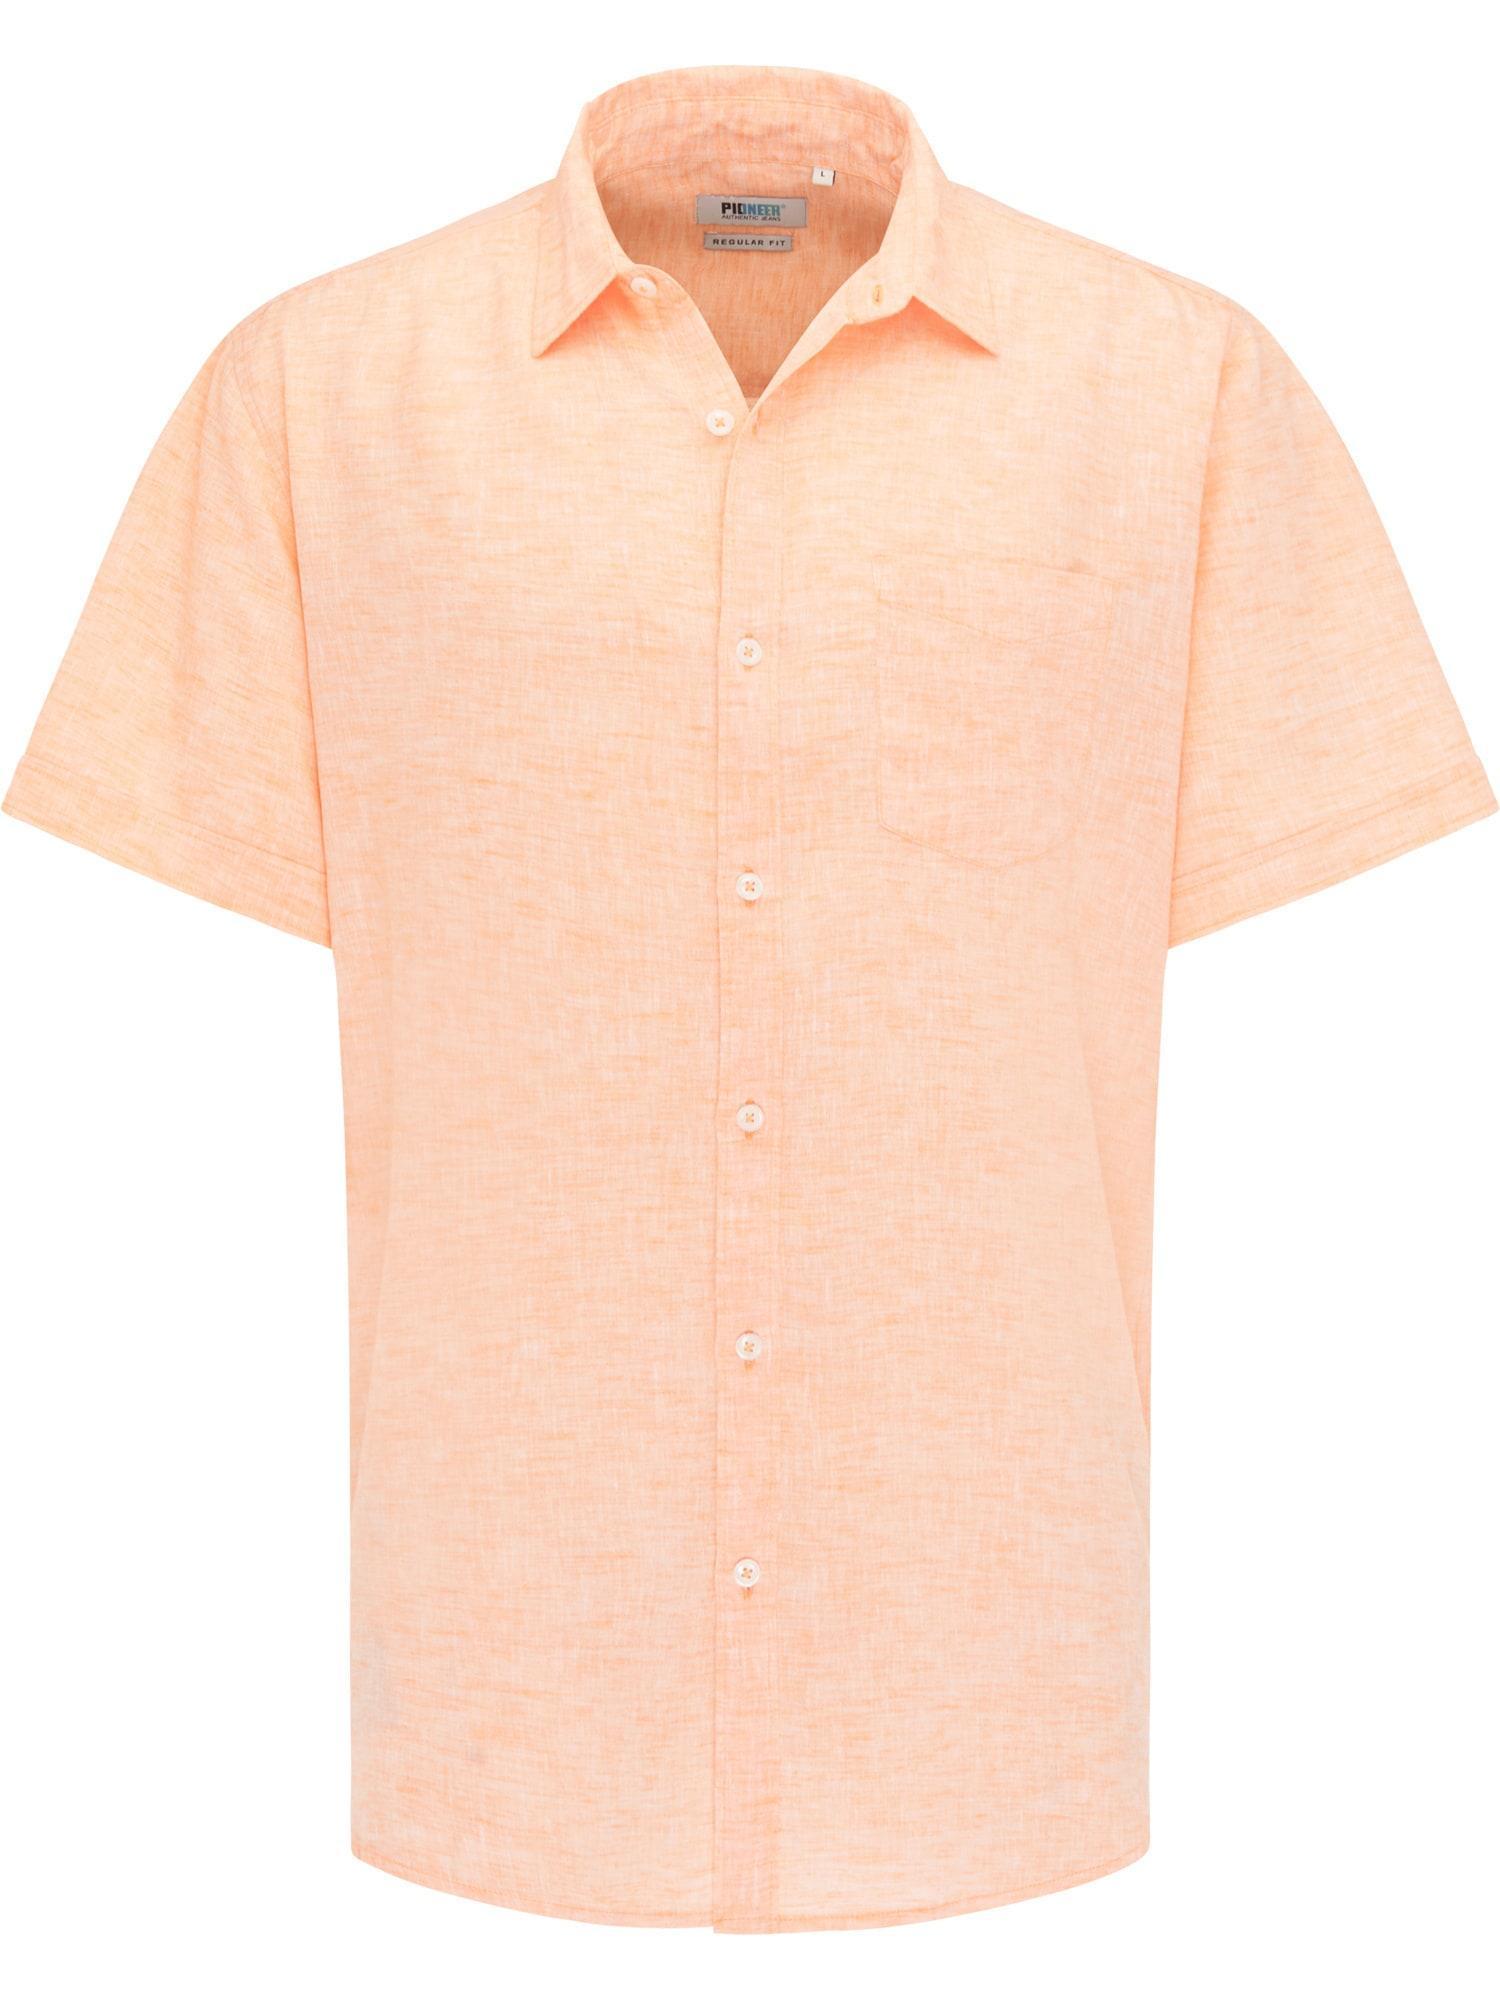 PIONEER Hemd apricot